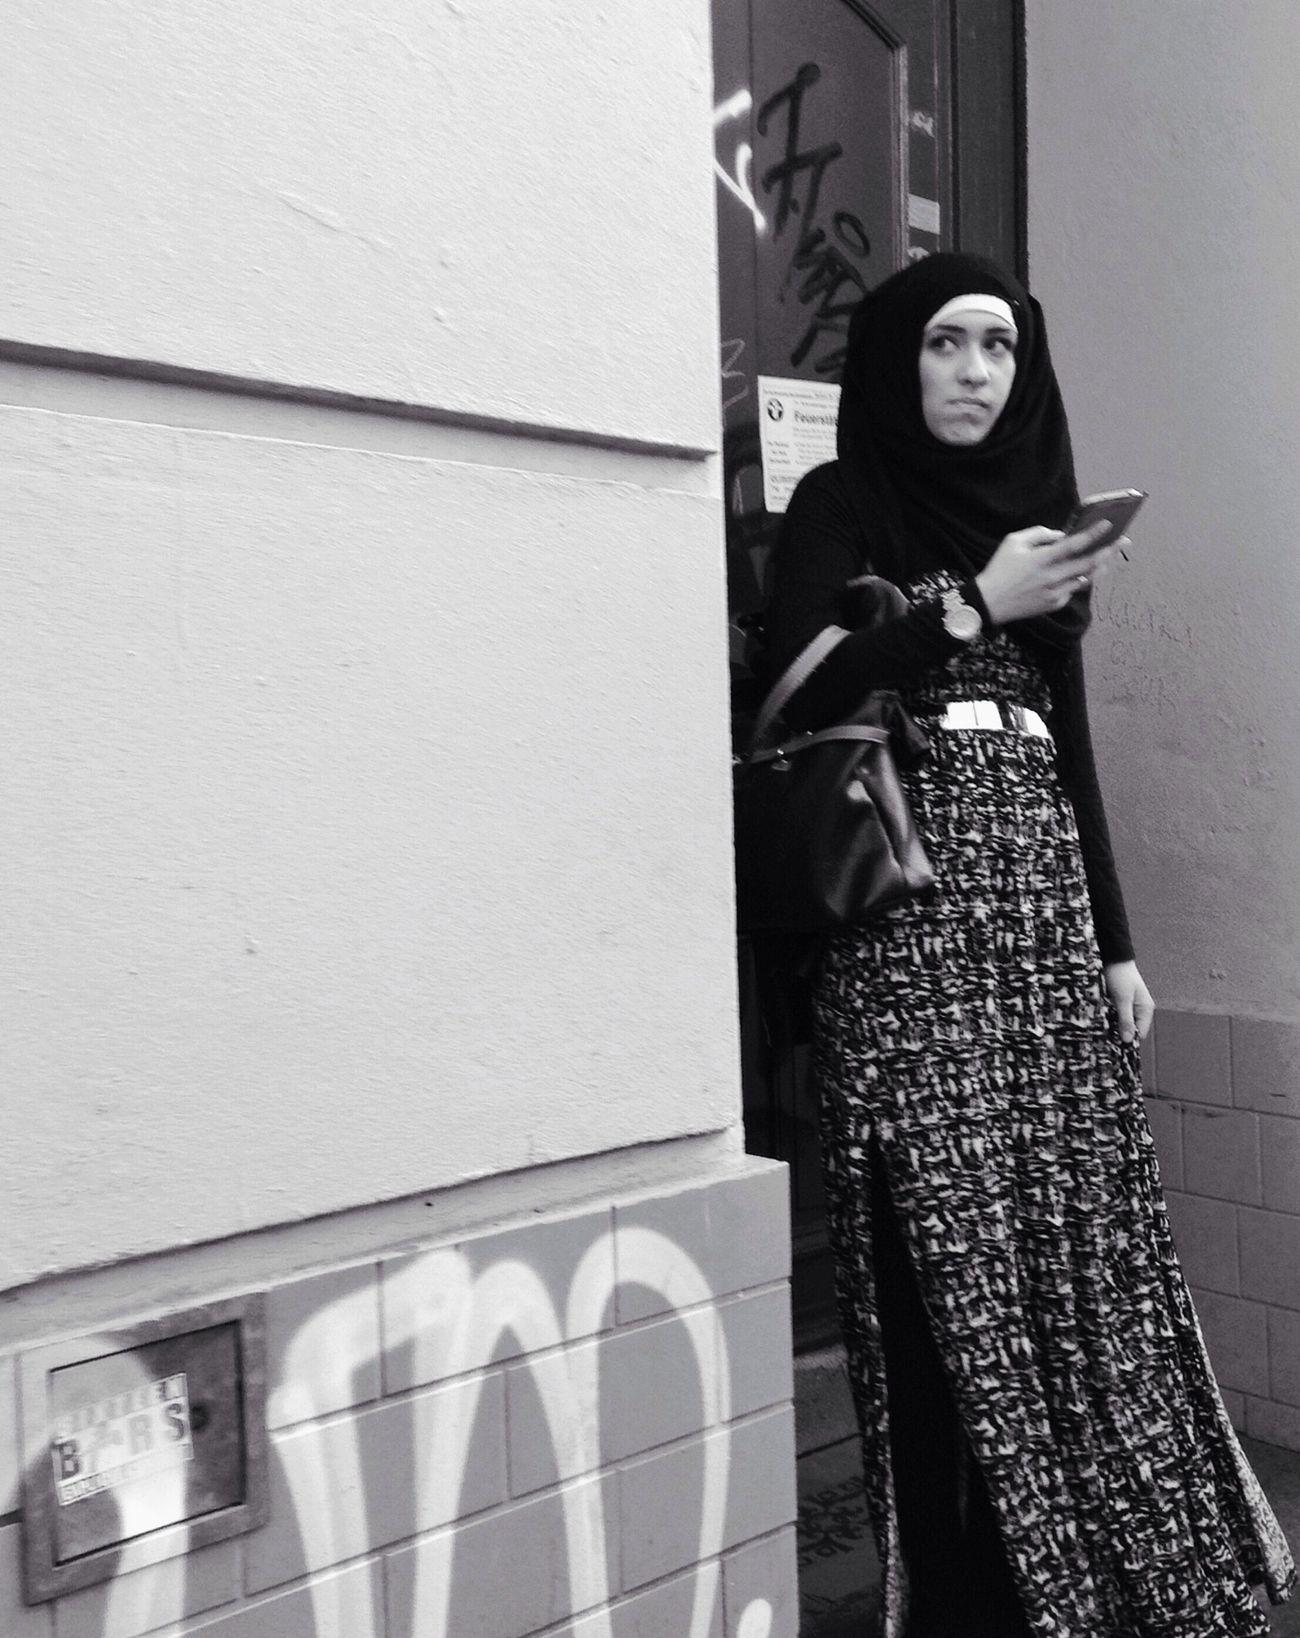 Shoot, Share, Learn - EyeEm Berlin Meetup The Spirit Of Kreuzberg Vscocam Finding The Next Vivian Maier